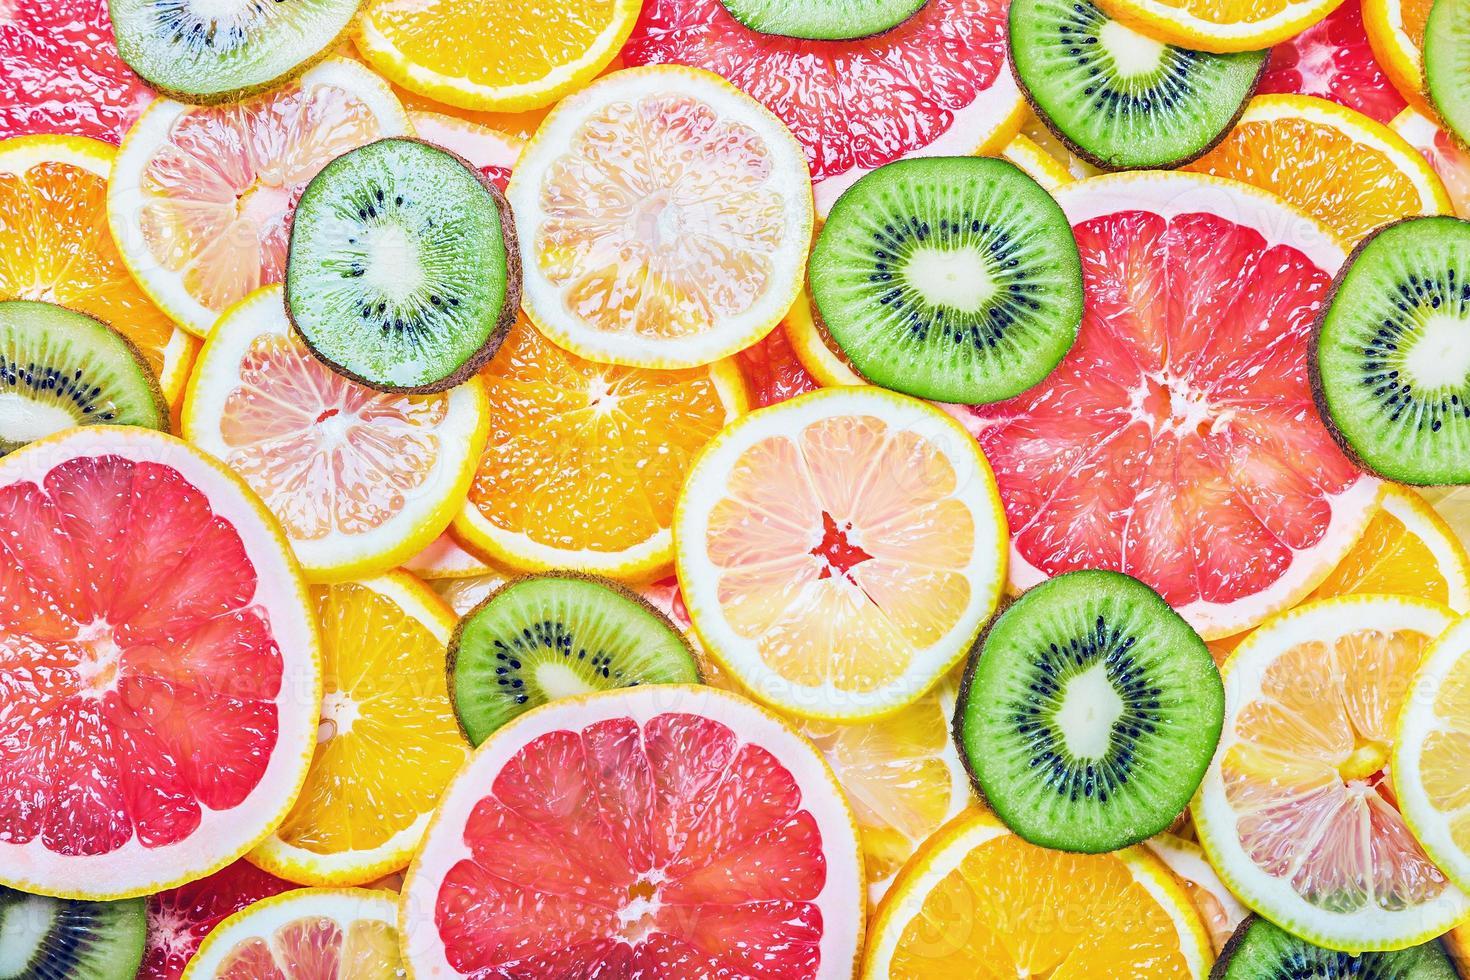 rodajas de fruta fresca foto